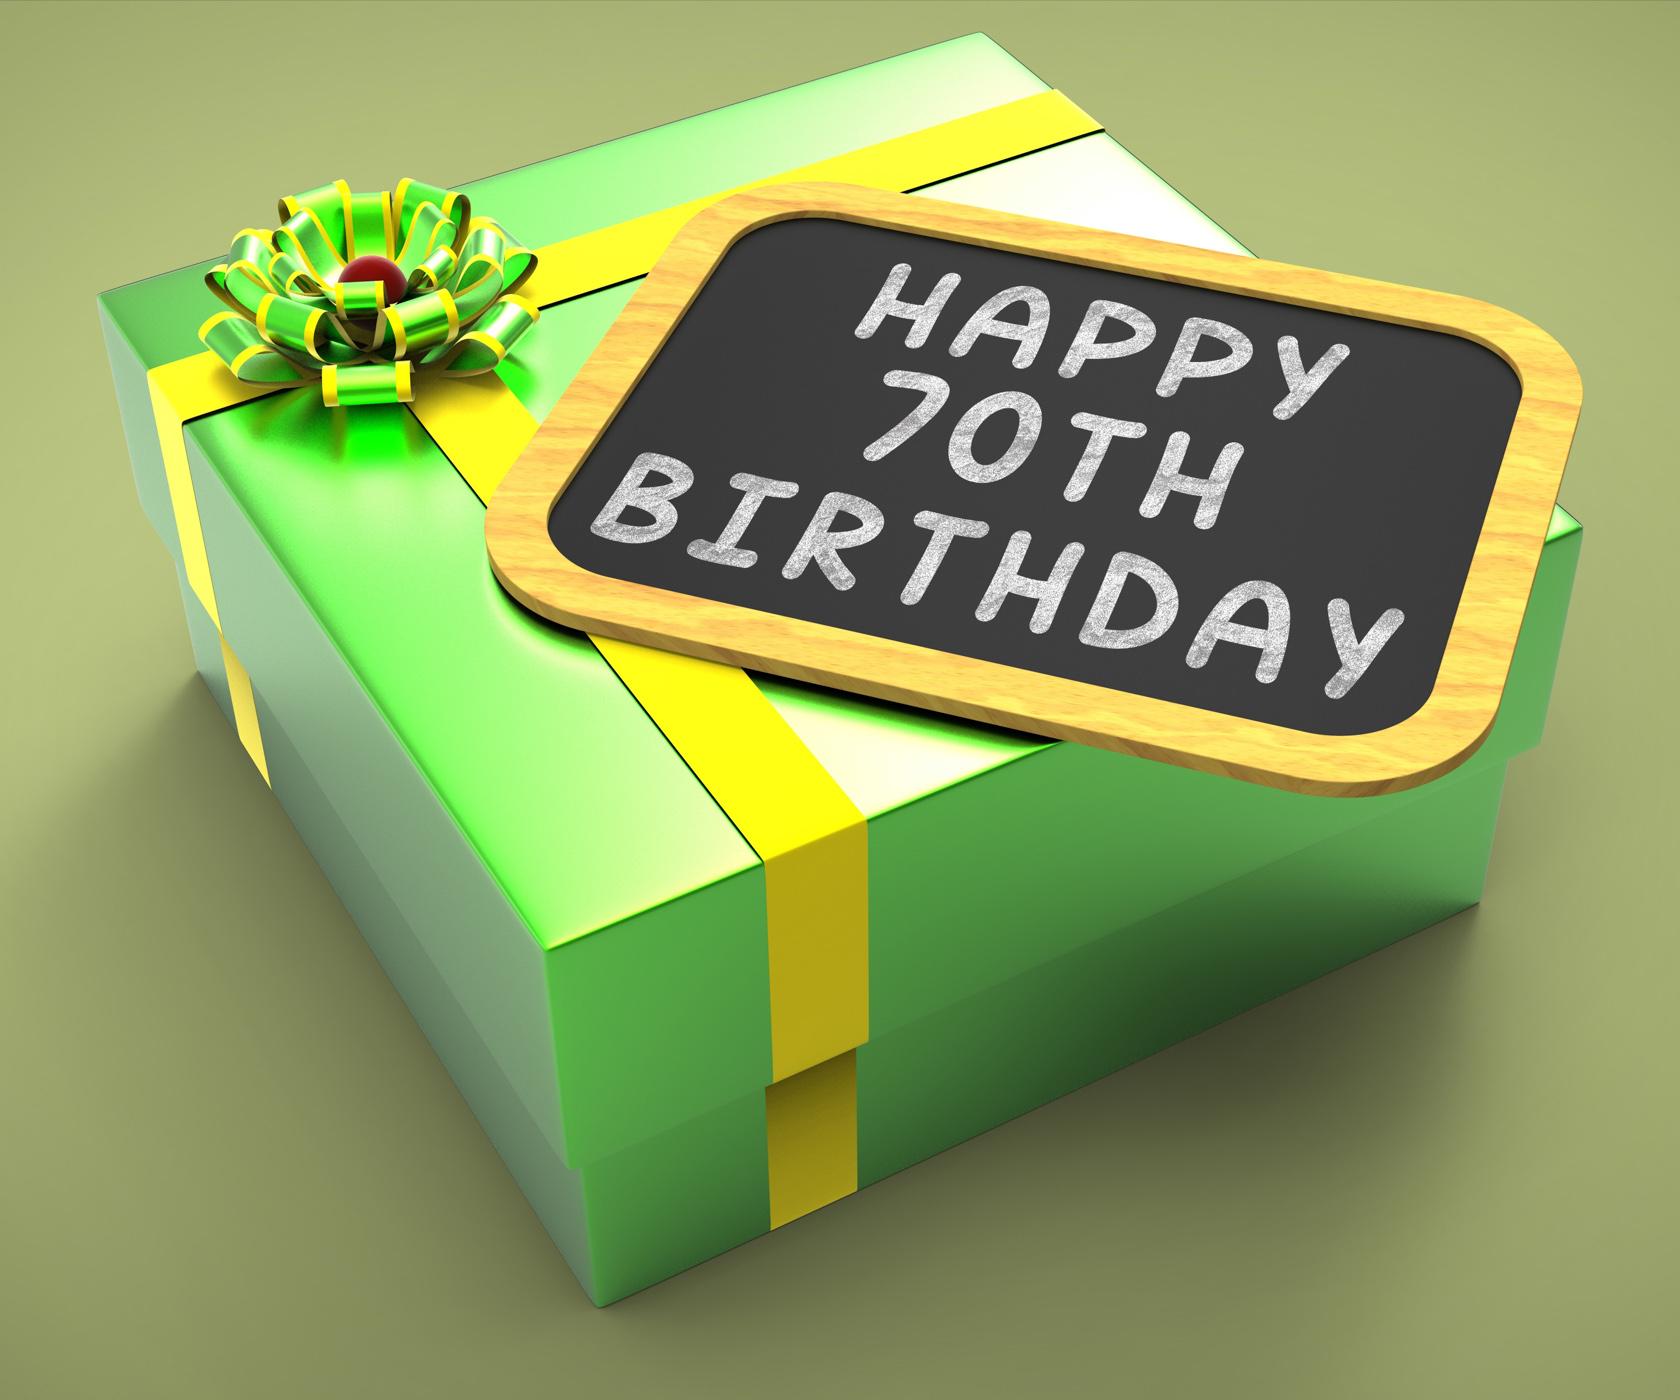 Happy seventieth birthday present means grandfather birthday or annive photo